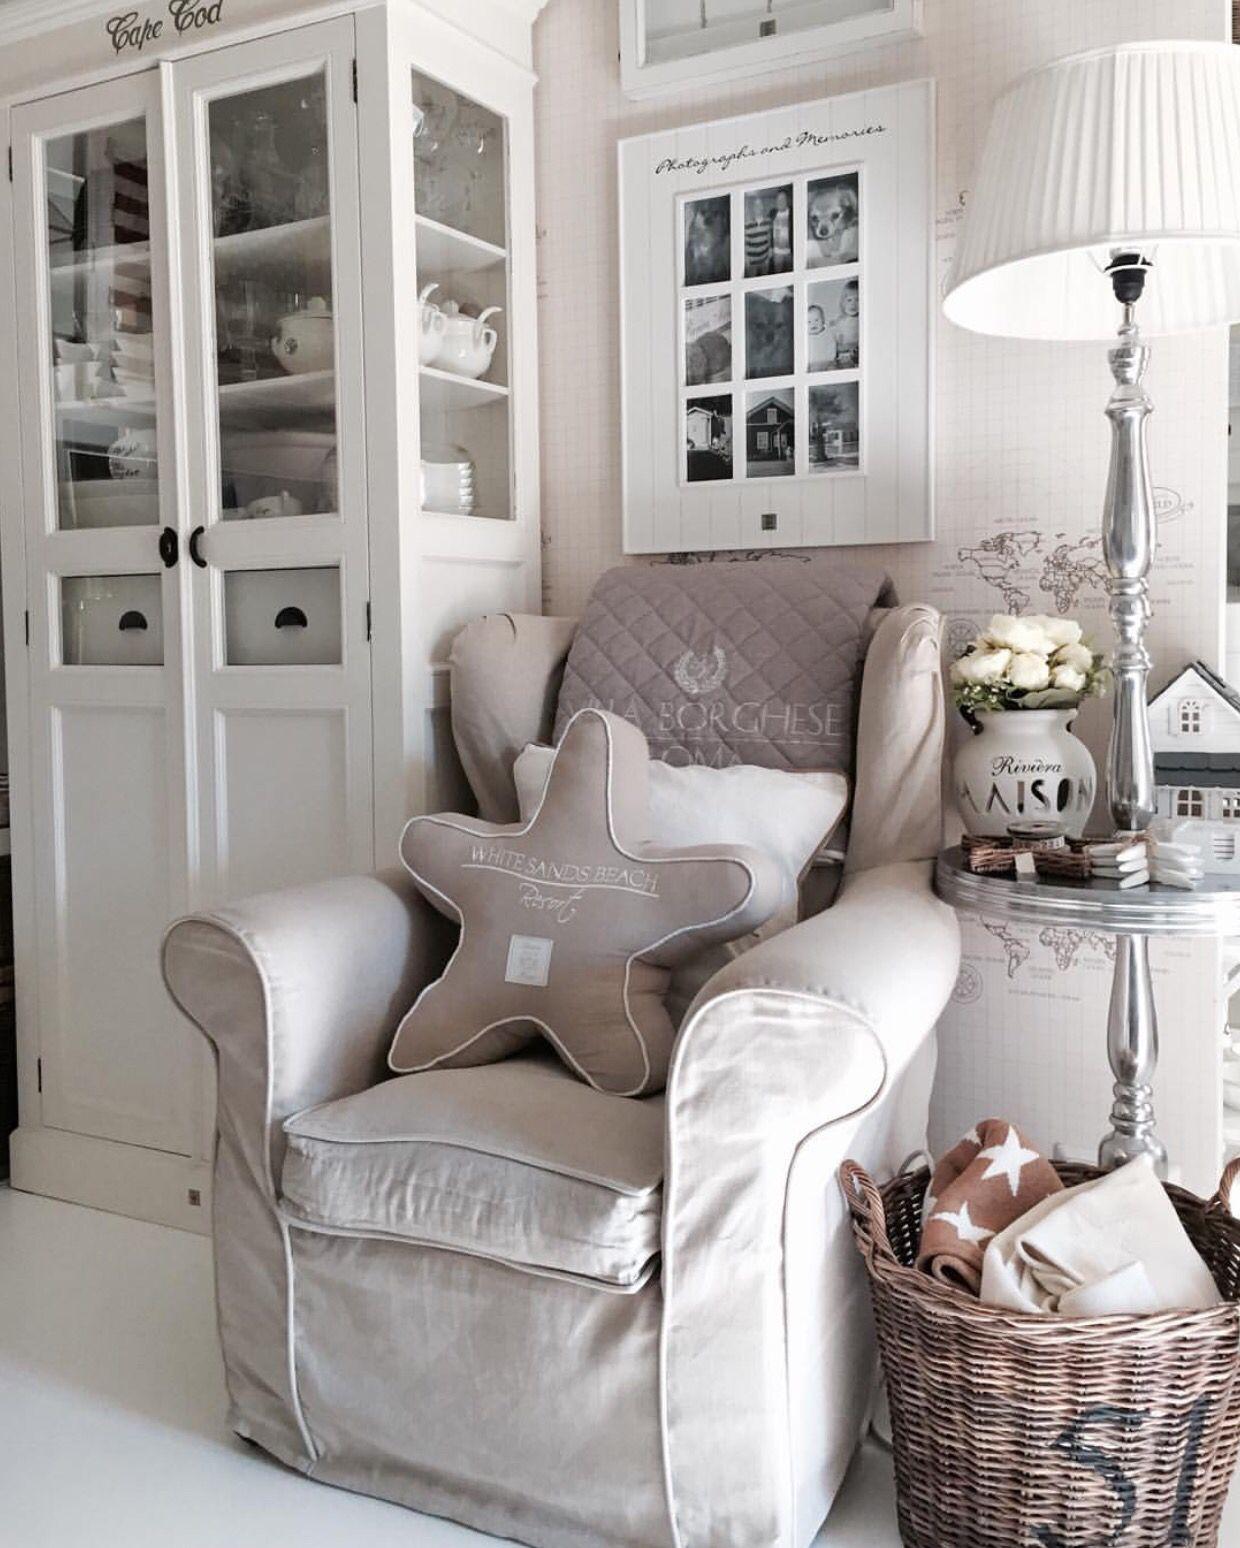 Bankhoes Riviera Maison.Landelijke Zithoek In Shabby Chic Riviera Maison Stijl Home Sweet